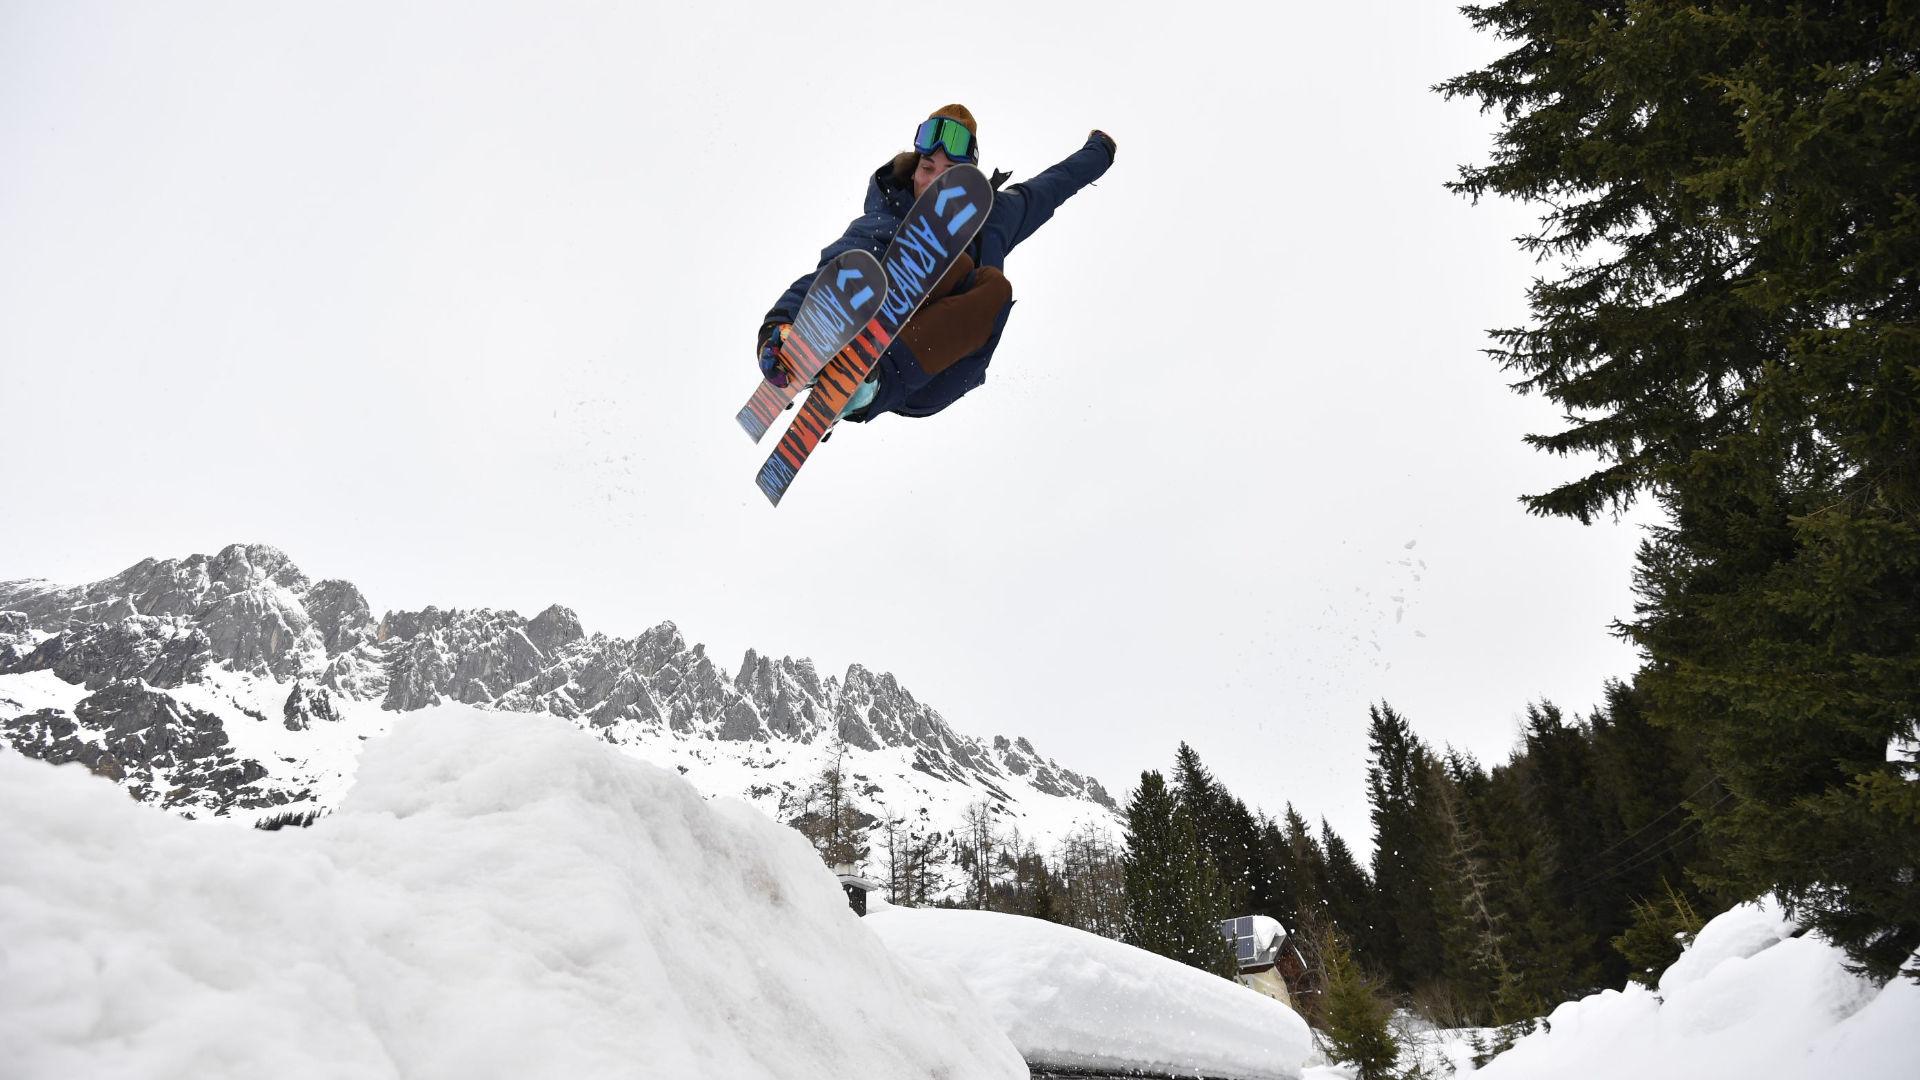 Freeskier taking air off a kicker